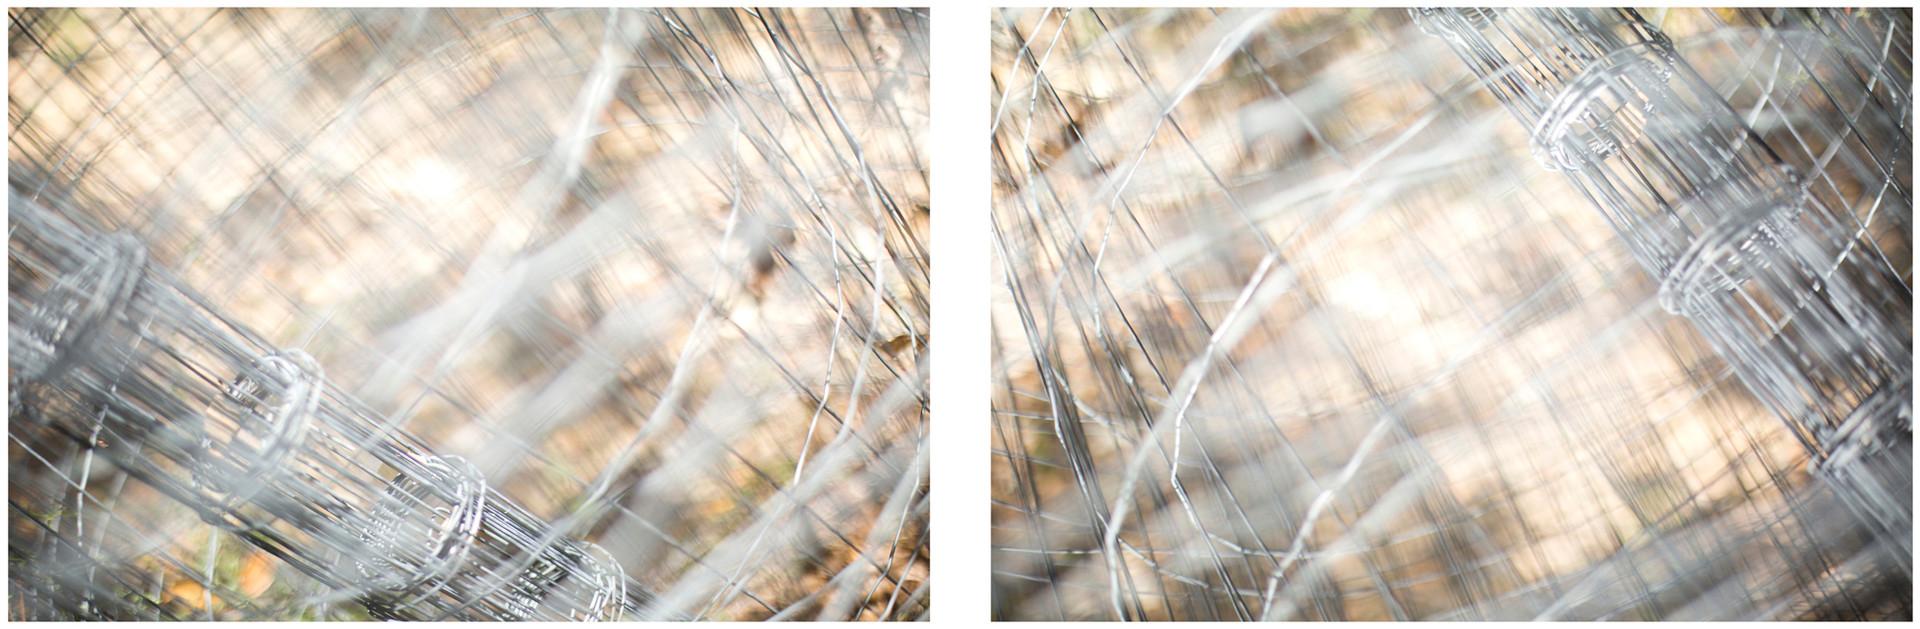 "18. ""Illumination"", 2014, by Ryan J. Bush"